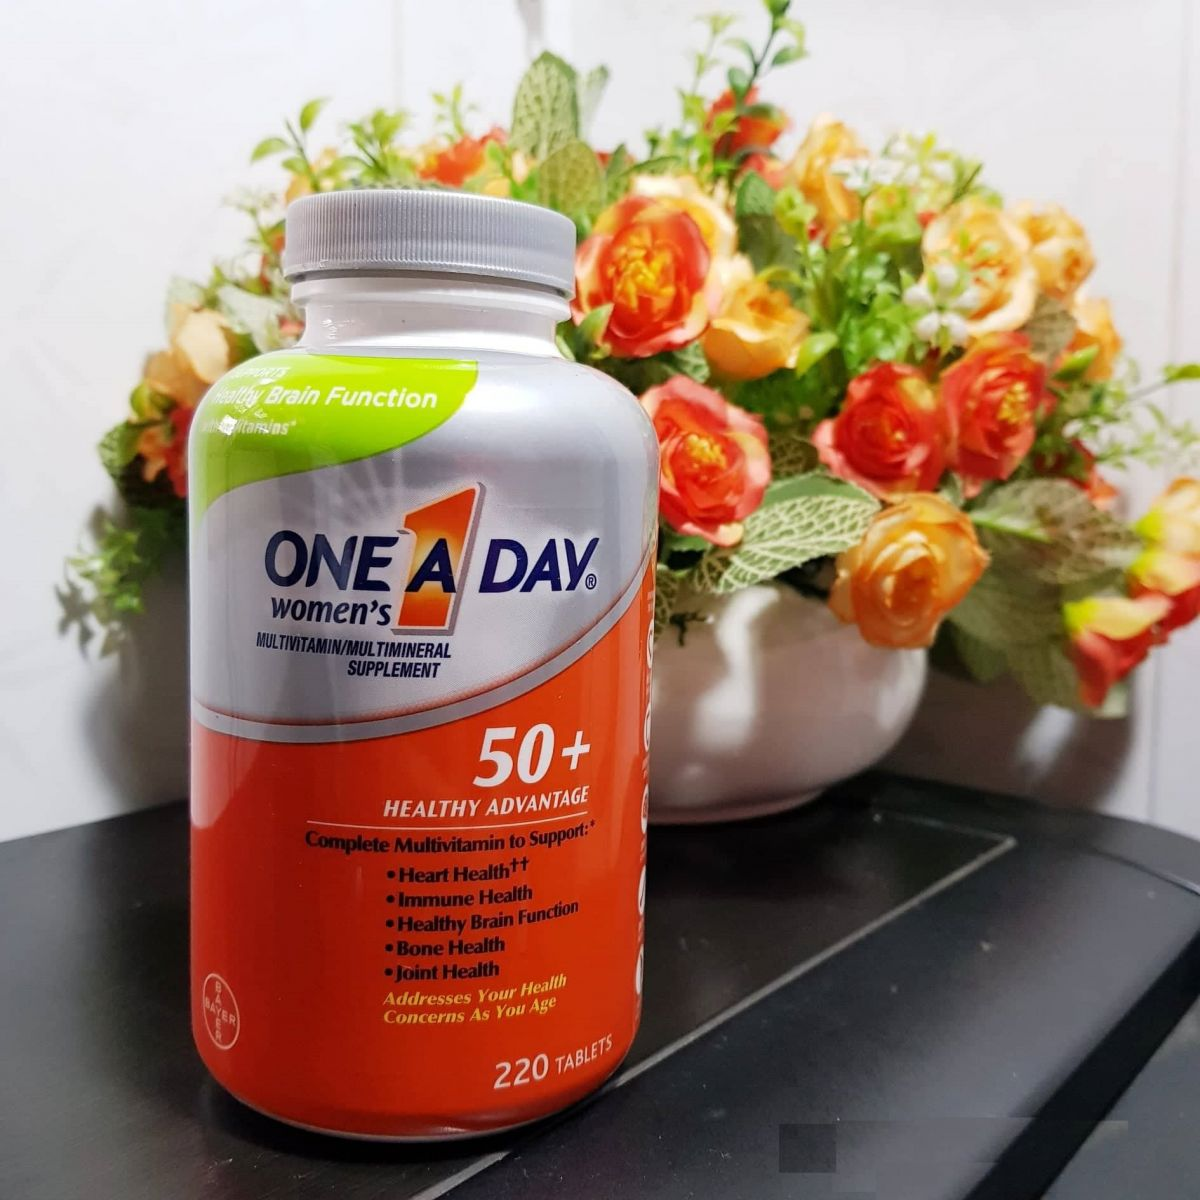 vitamin-tong-hop-danh-cho-nu-gioi-tren-50-tuoi